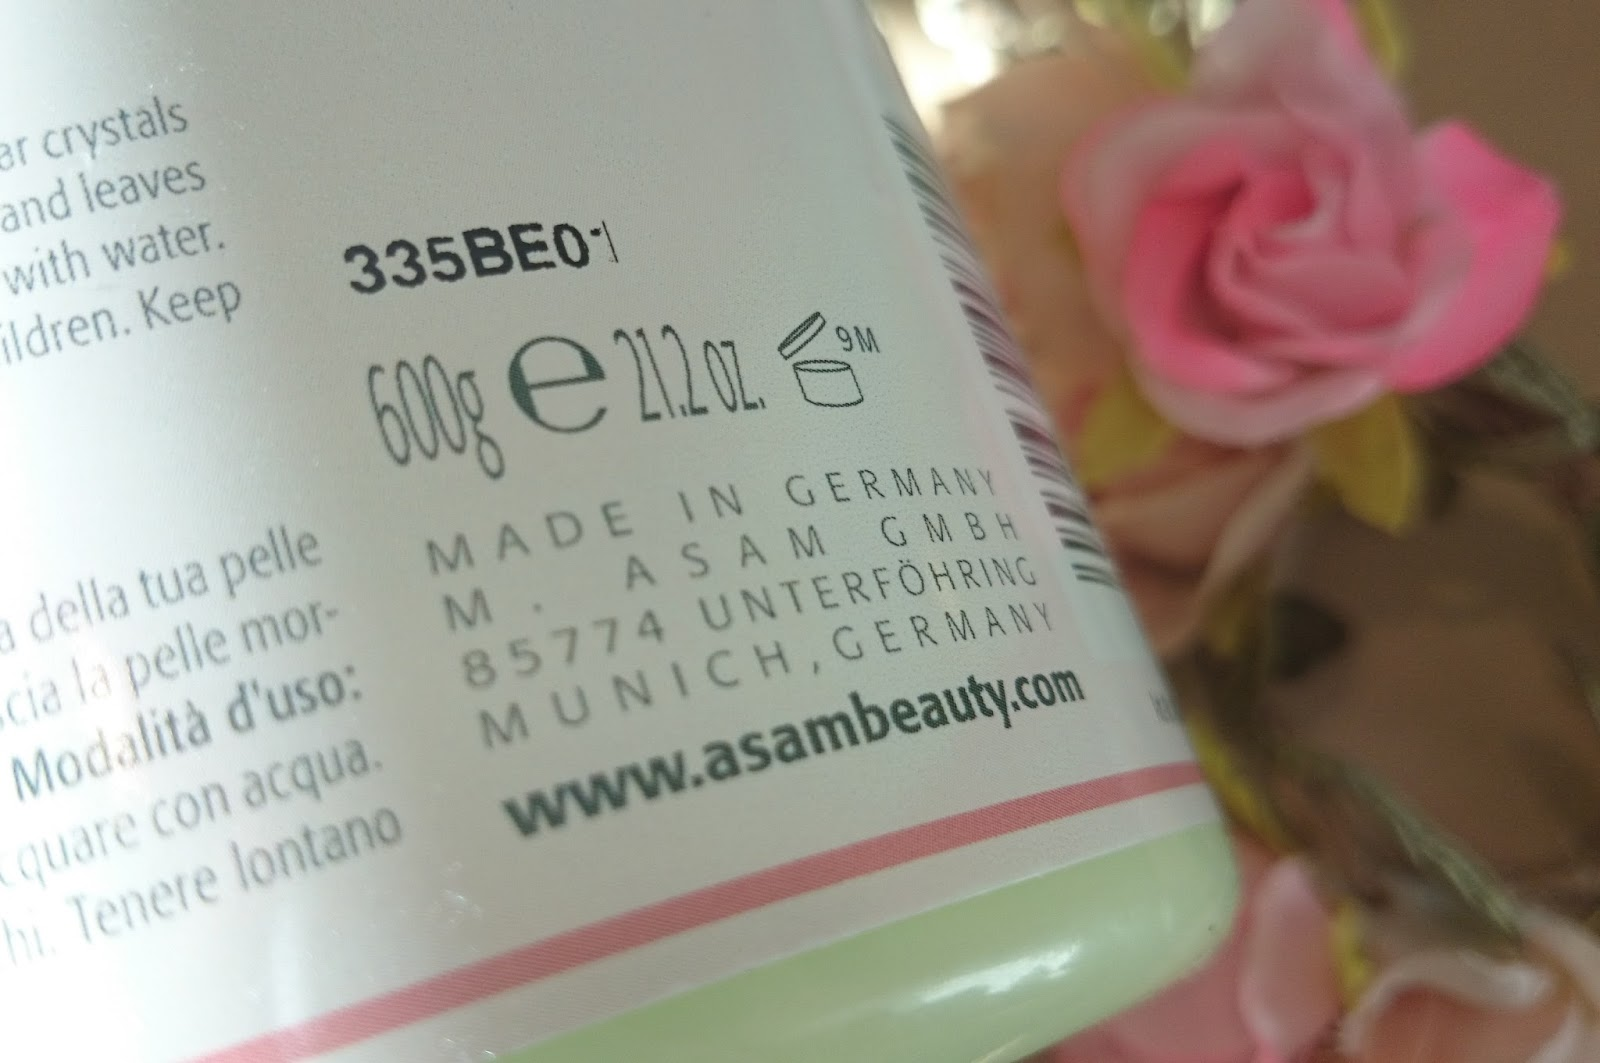 Produkttest M. Asam Dreams of Roses Peeling